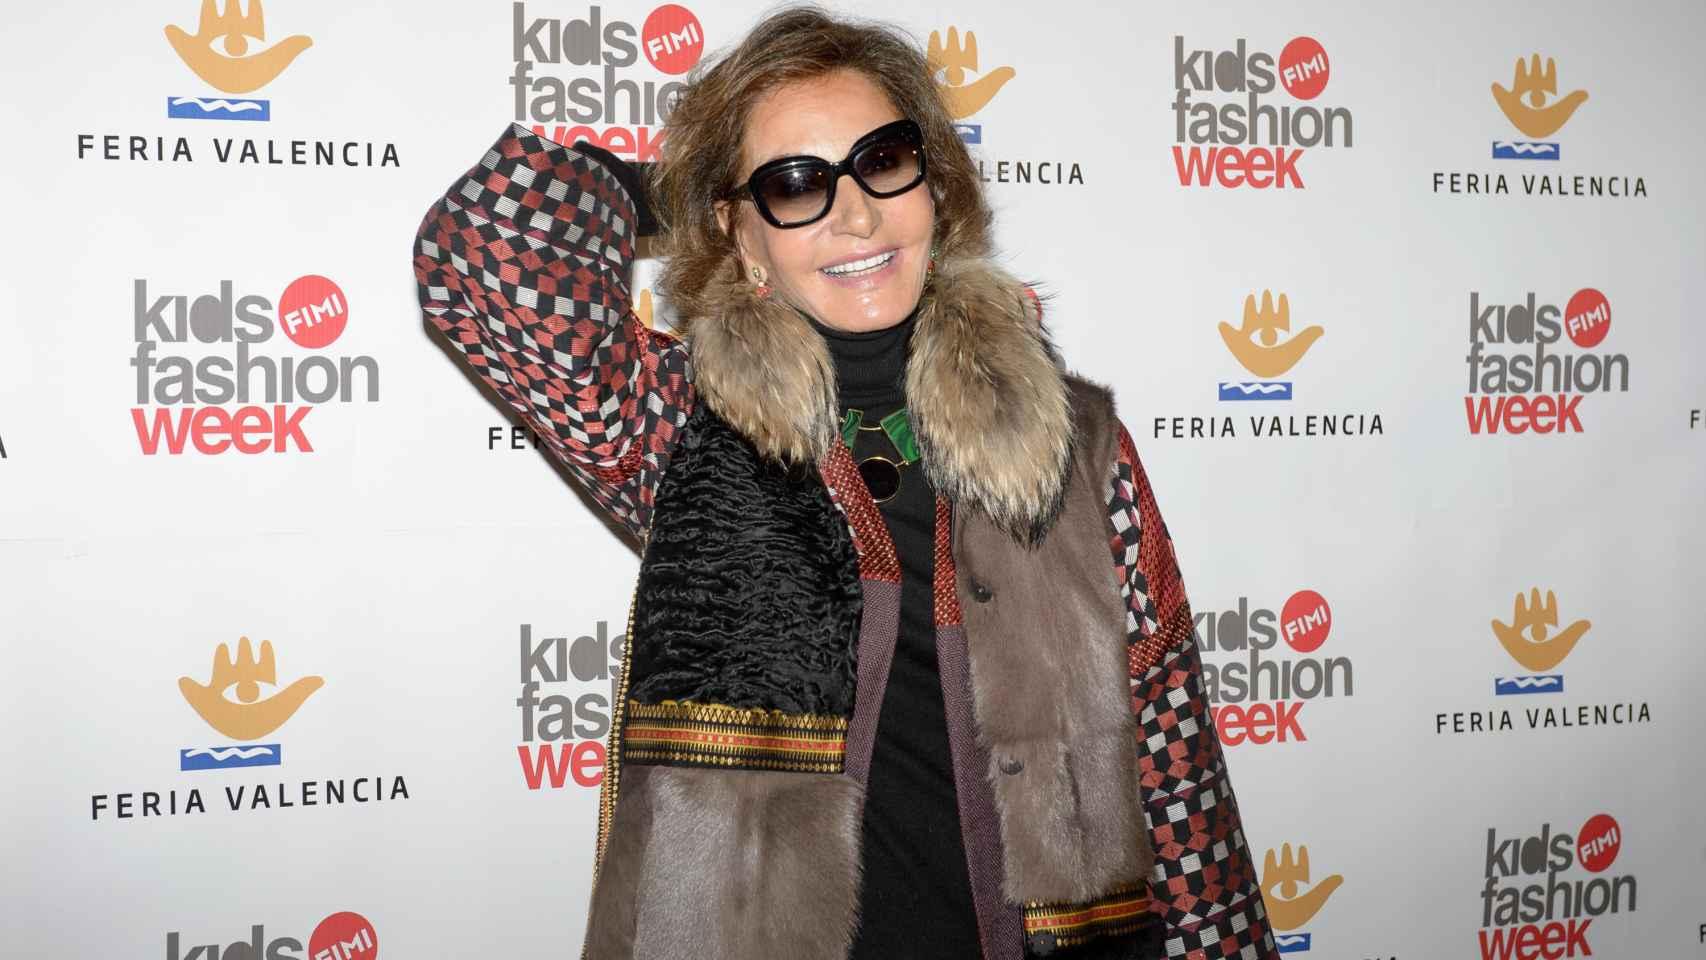 Naty Abascal ha querido apoyar la moda infantil